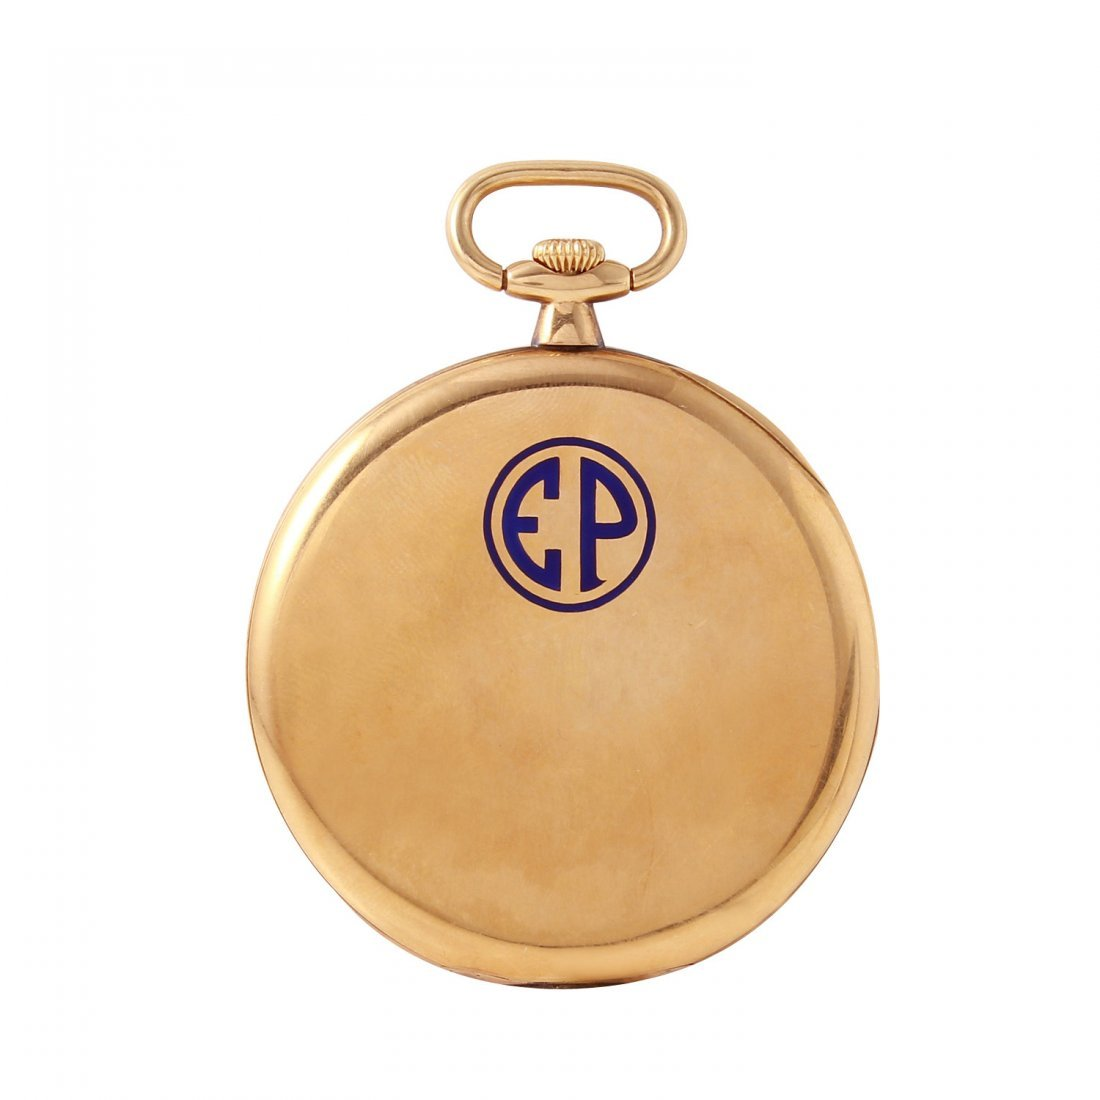 J.E. Caldwell 14KT Gold with Ed Koehn Movement Pocket - 2